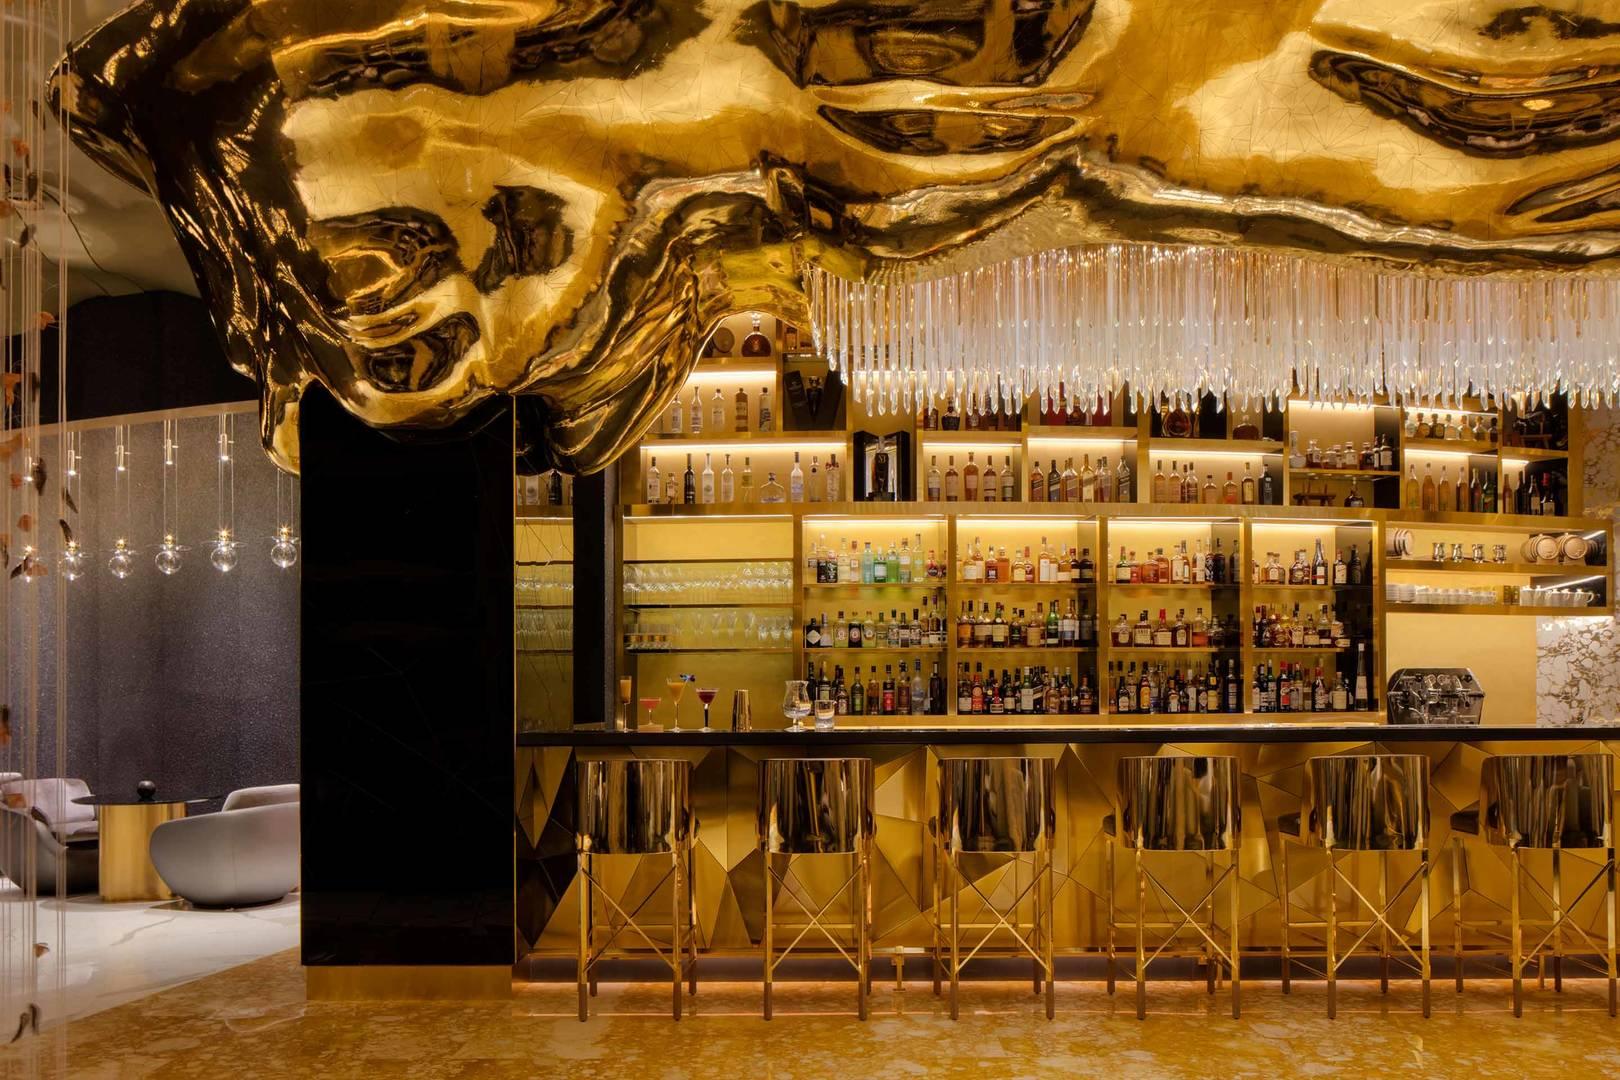 Burj Al Arab Gold on 27 bar area